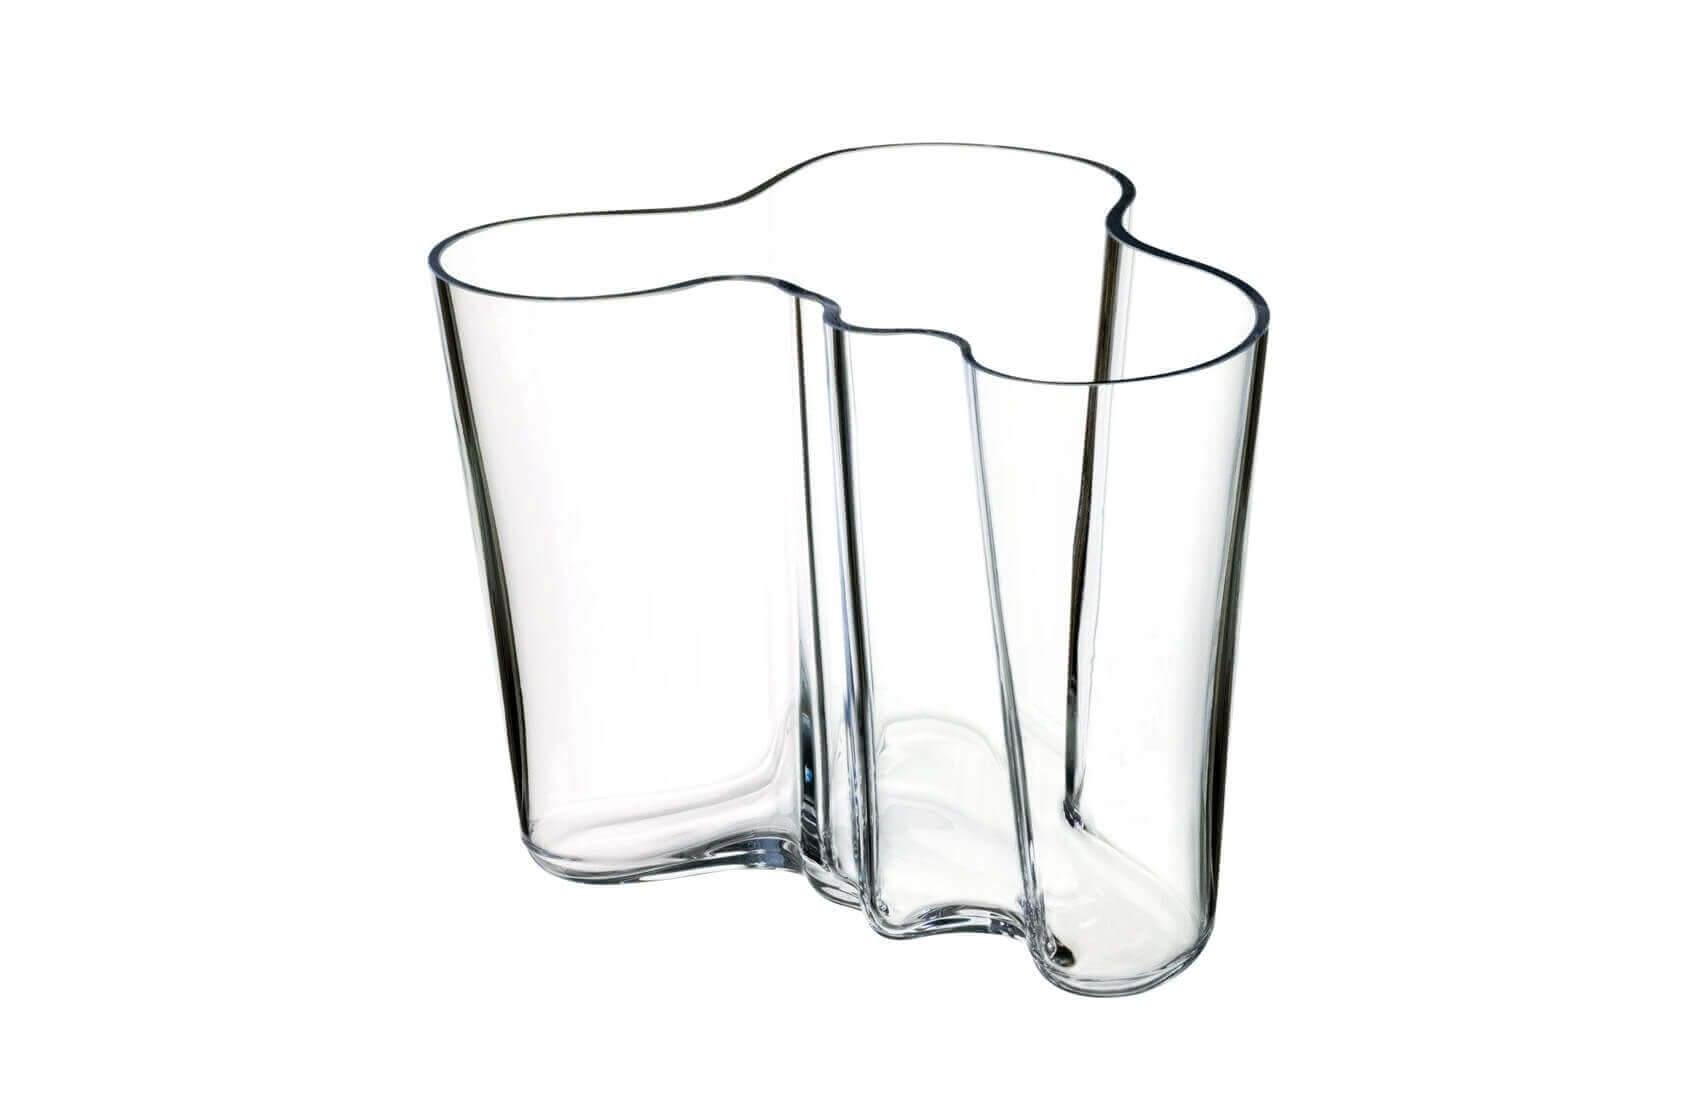 Wazon Aalto 16 cm Iittala transparentny